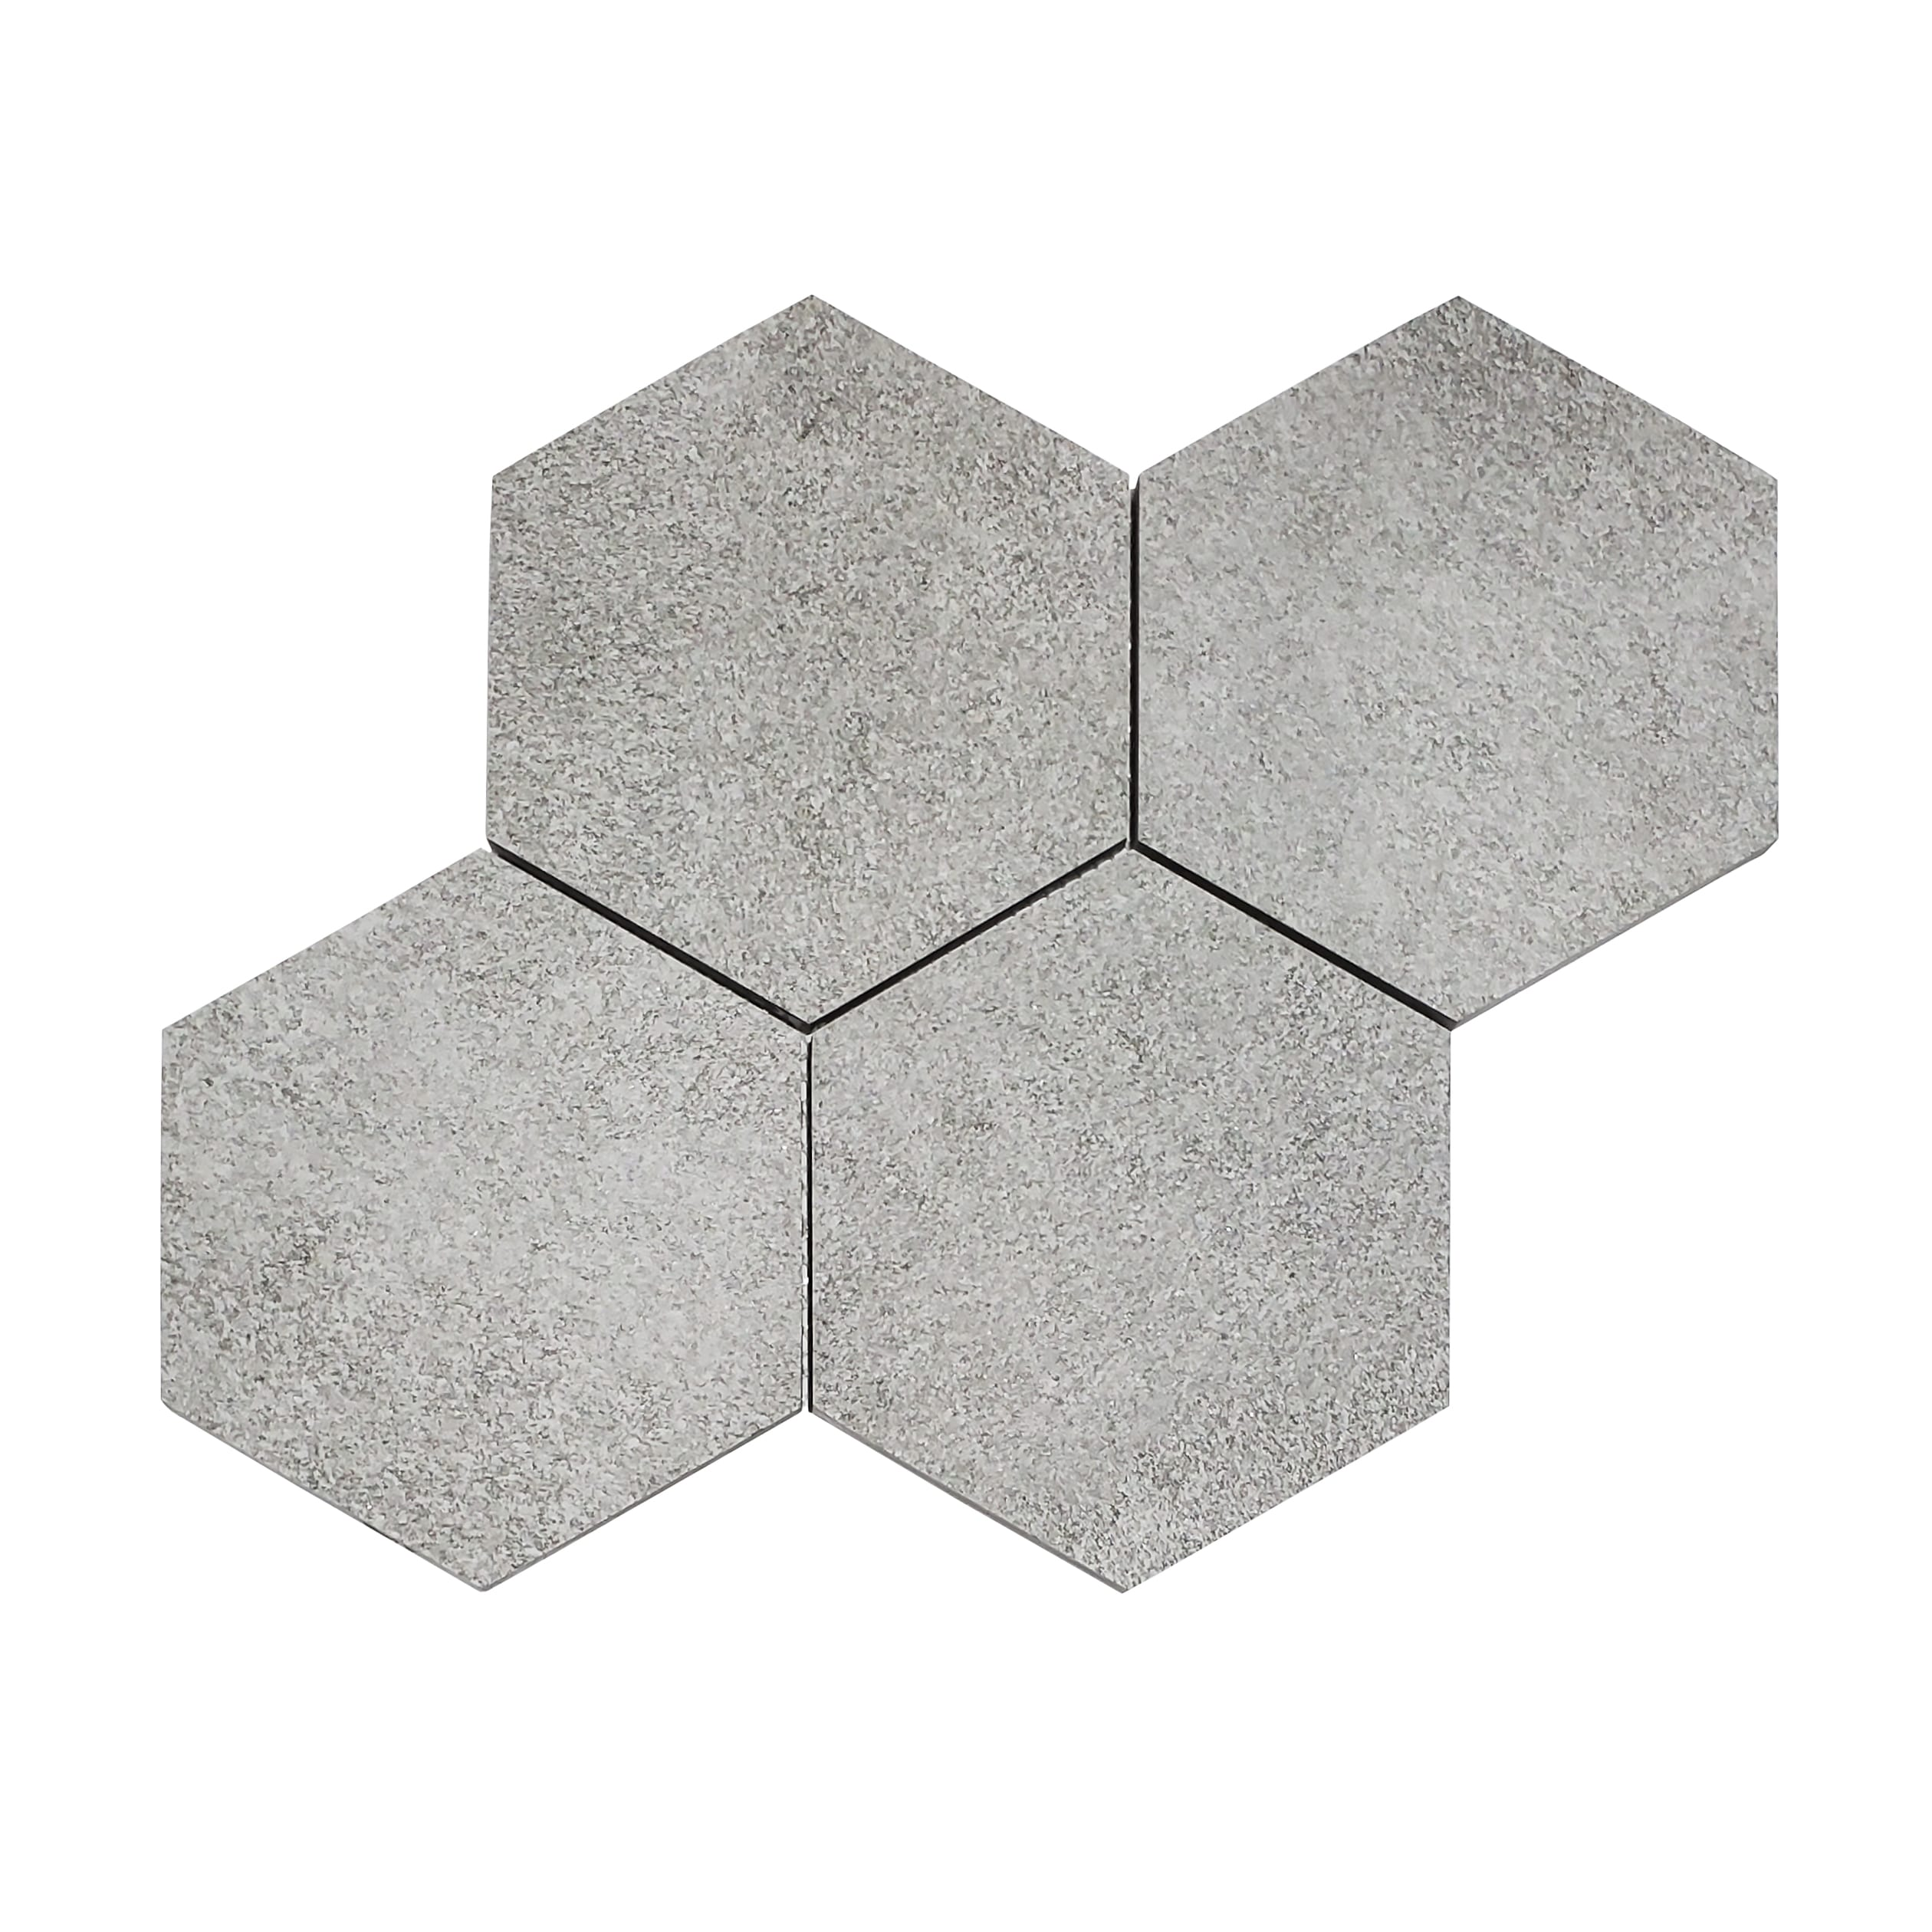 6in Matte Mjork Hexagon_Ash_16.19_9.49